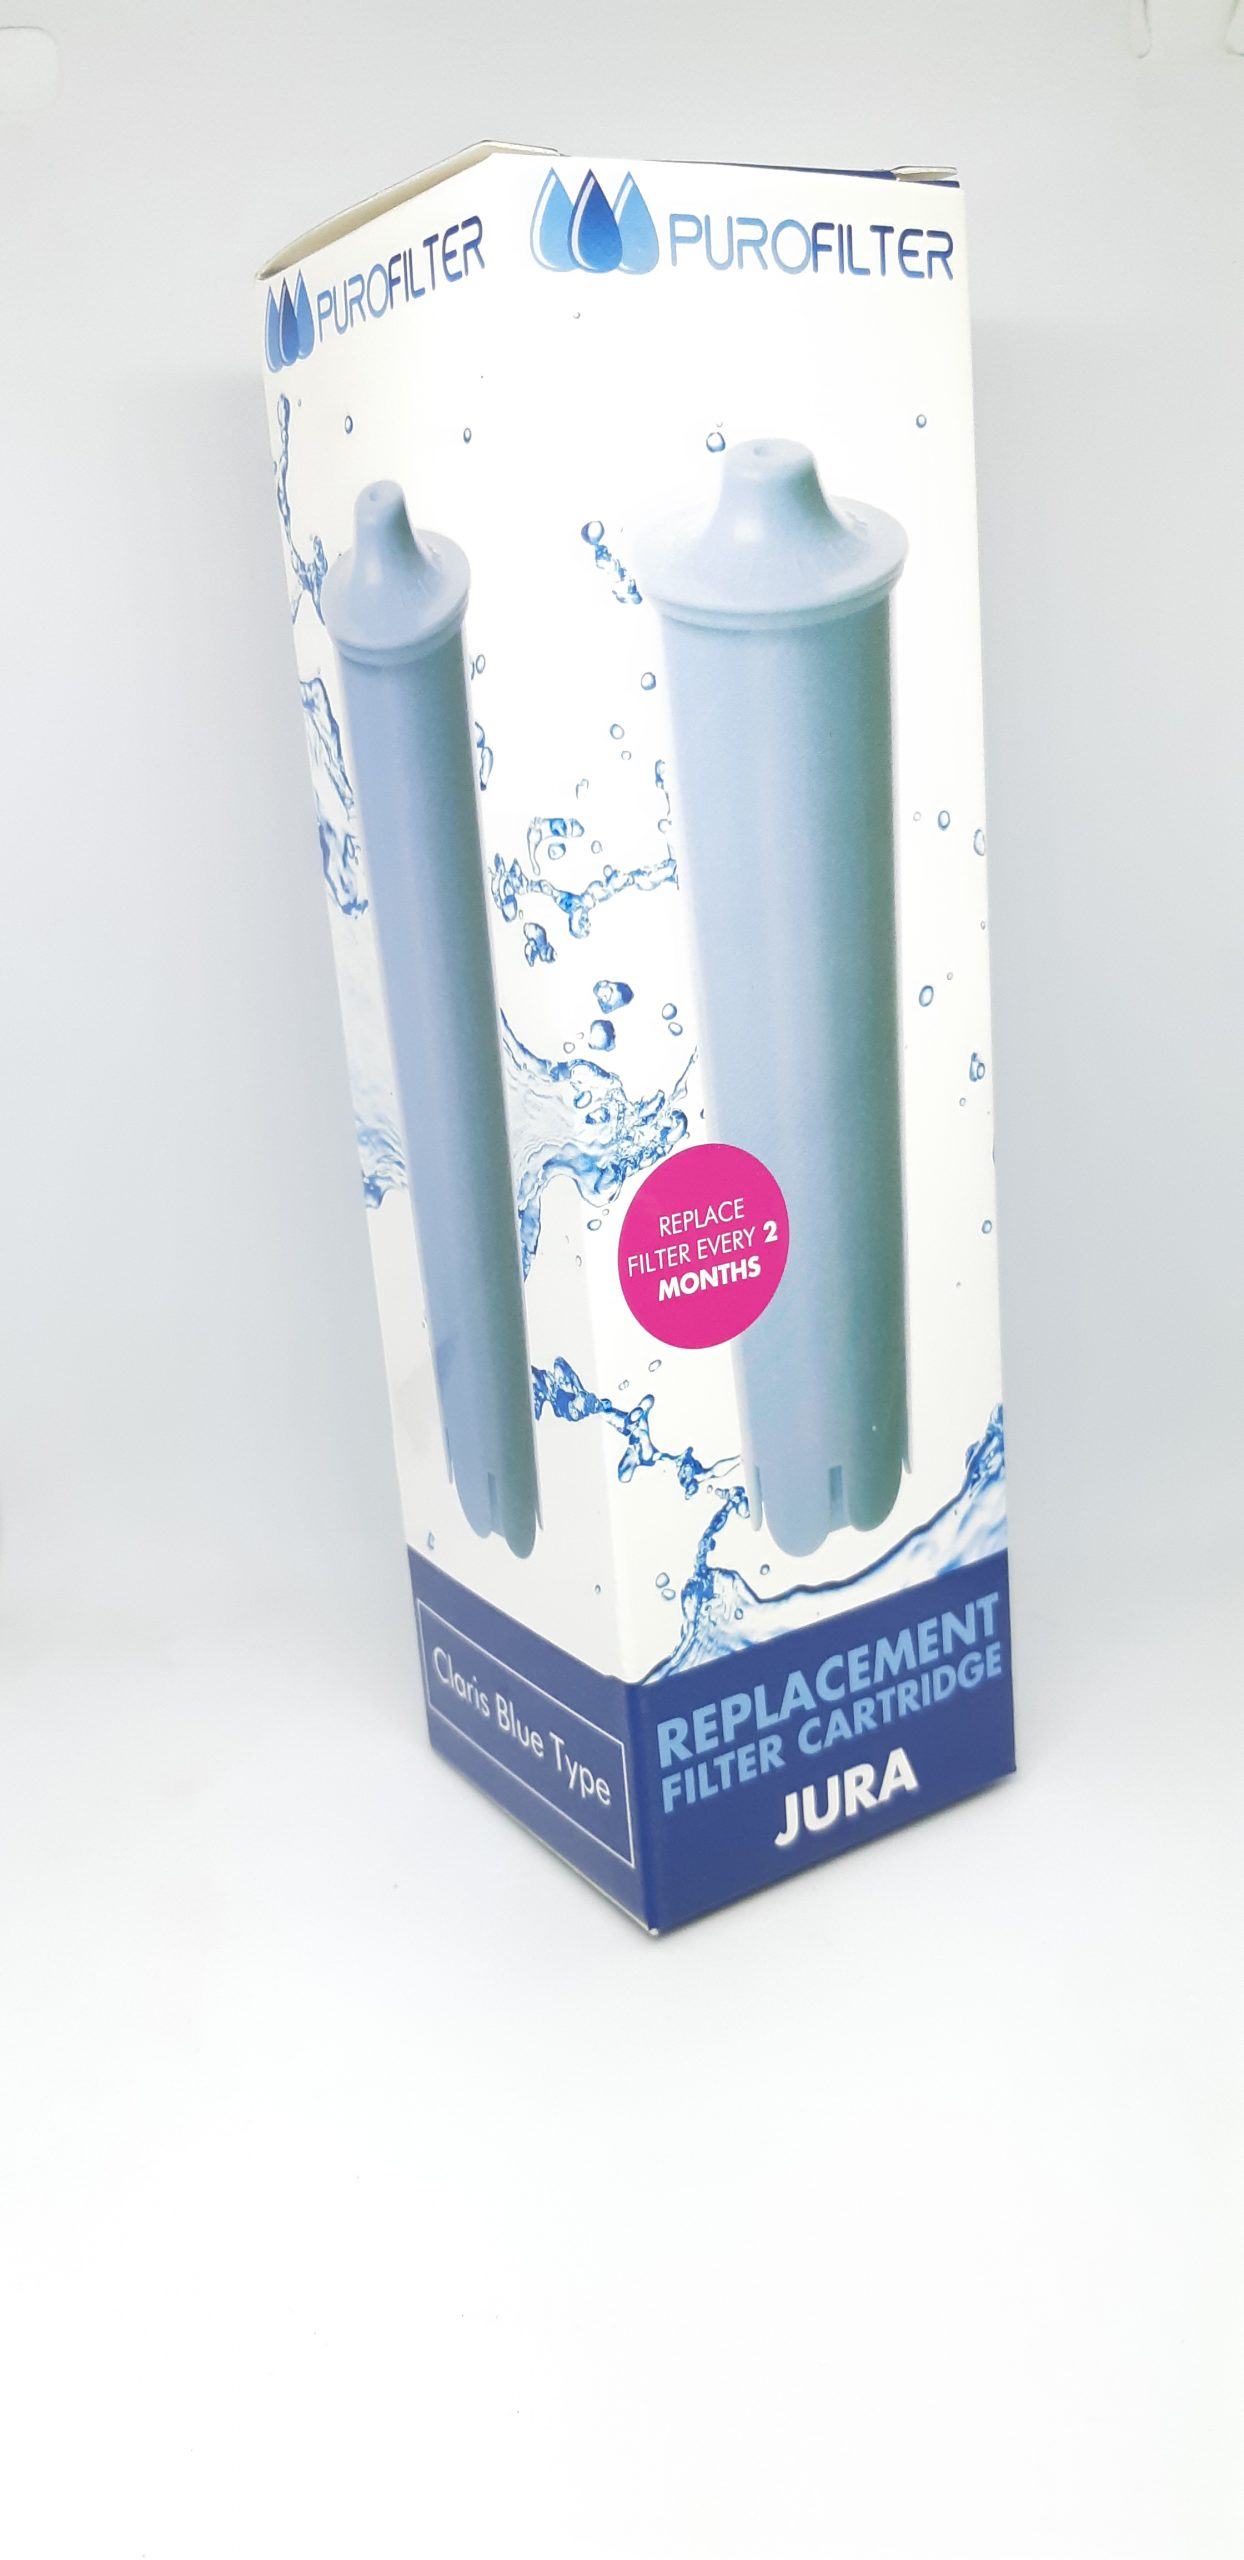 Филтър Purofilter Blue Jura Blue аналог 65-JU-18C